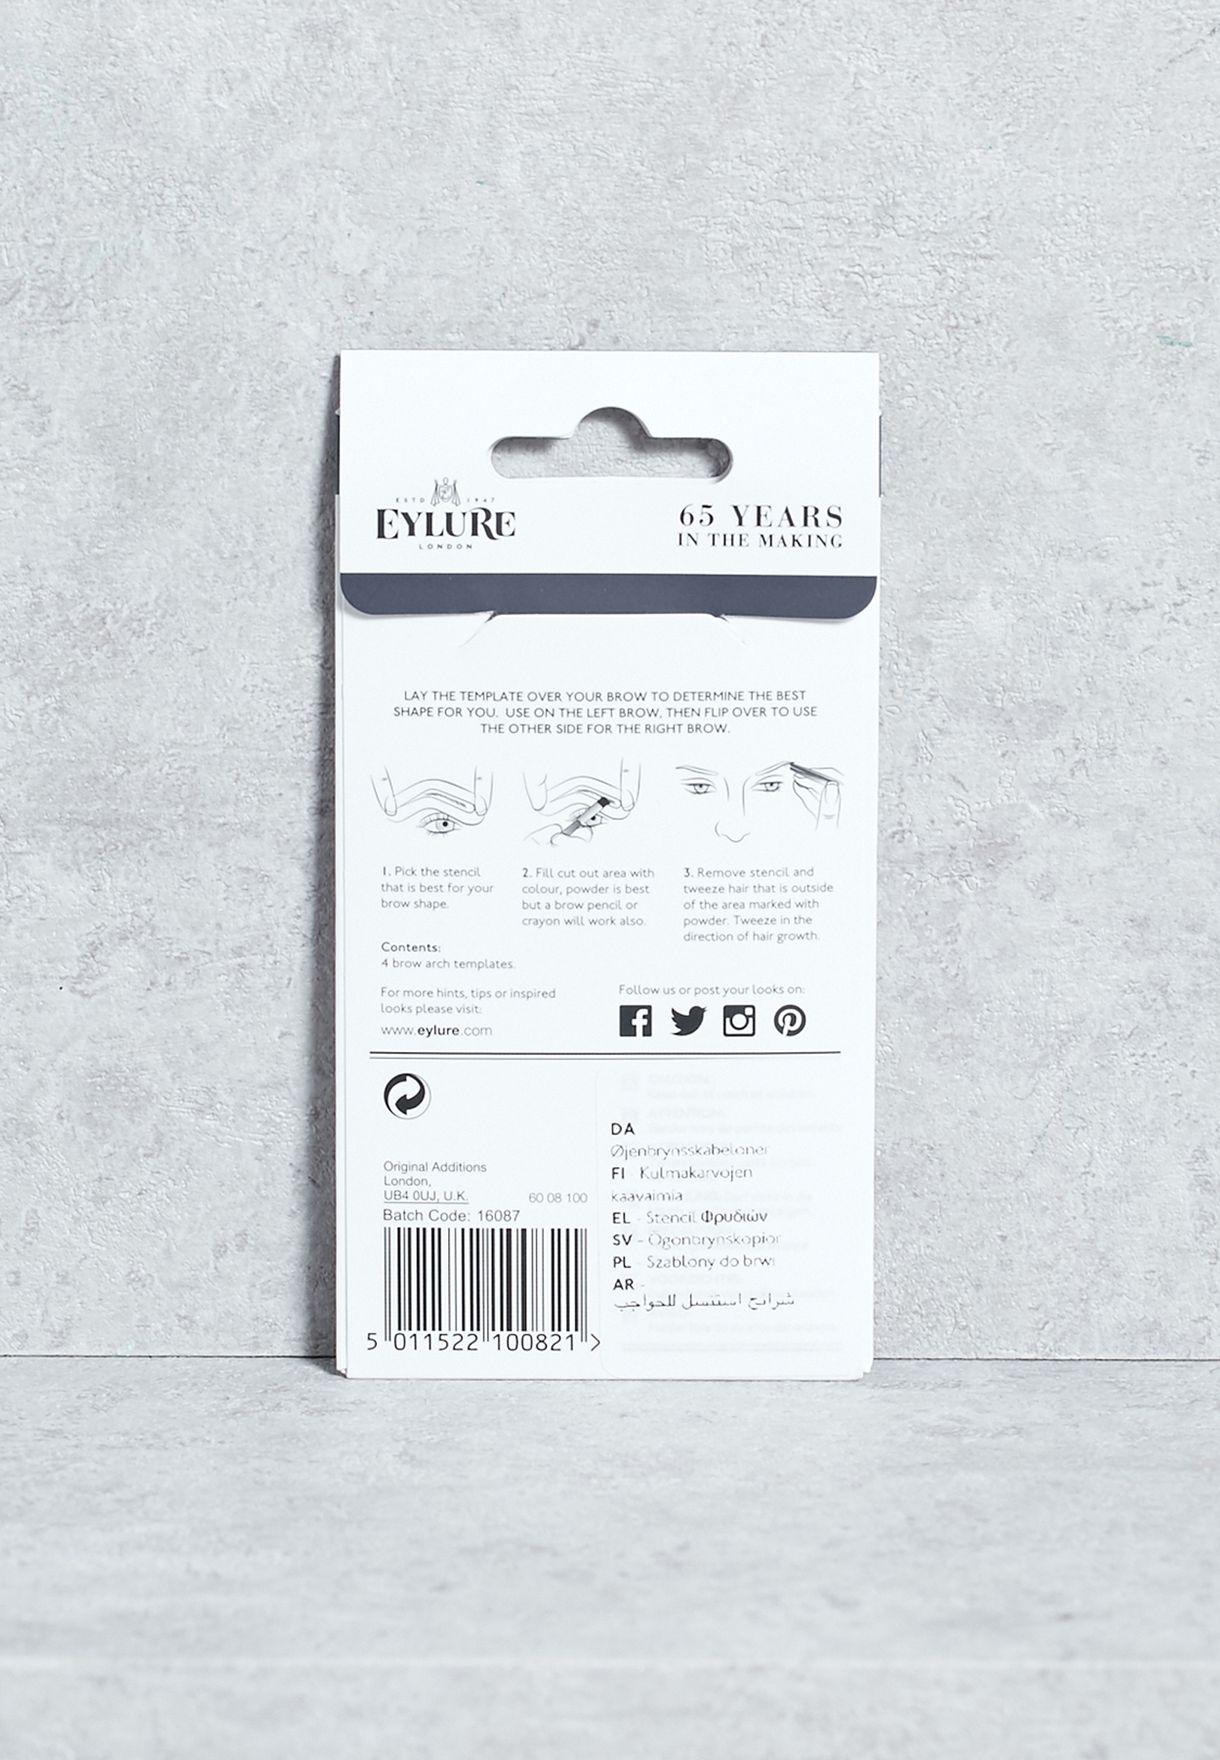 Shop Eylure Black Brow Stencils 5011522100821 For Women In Oman